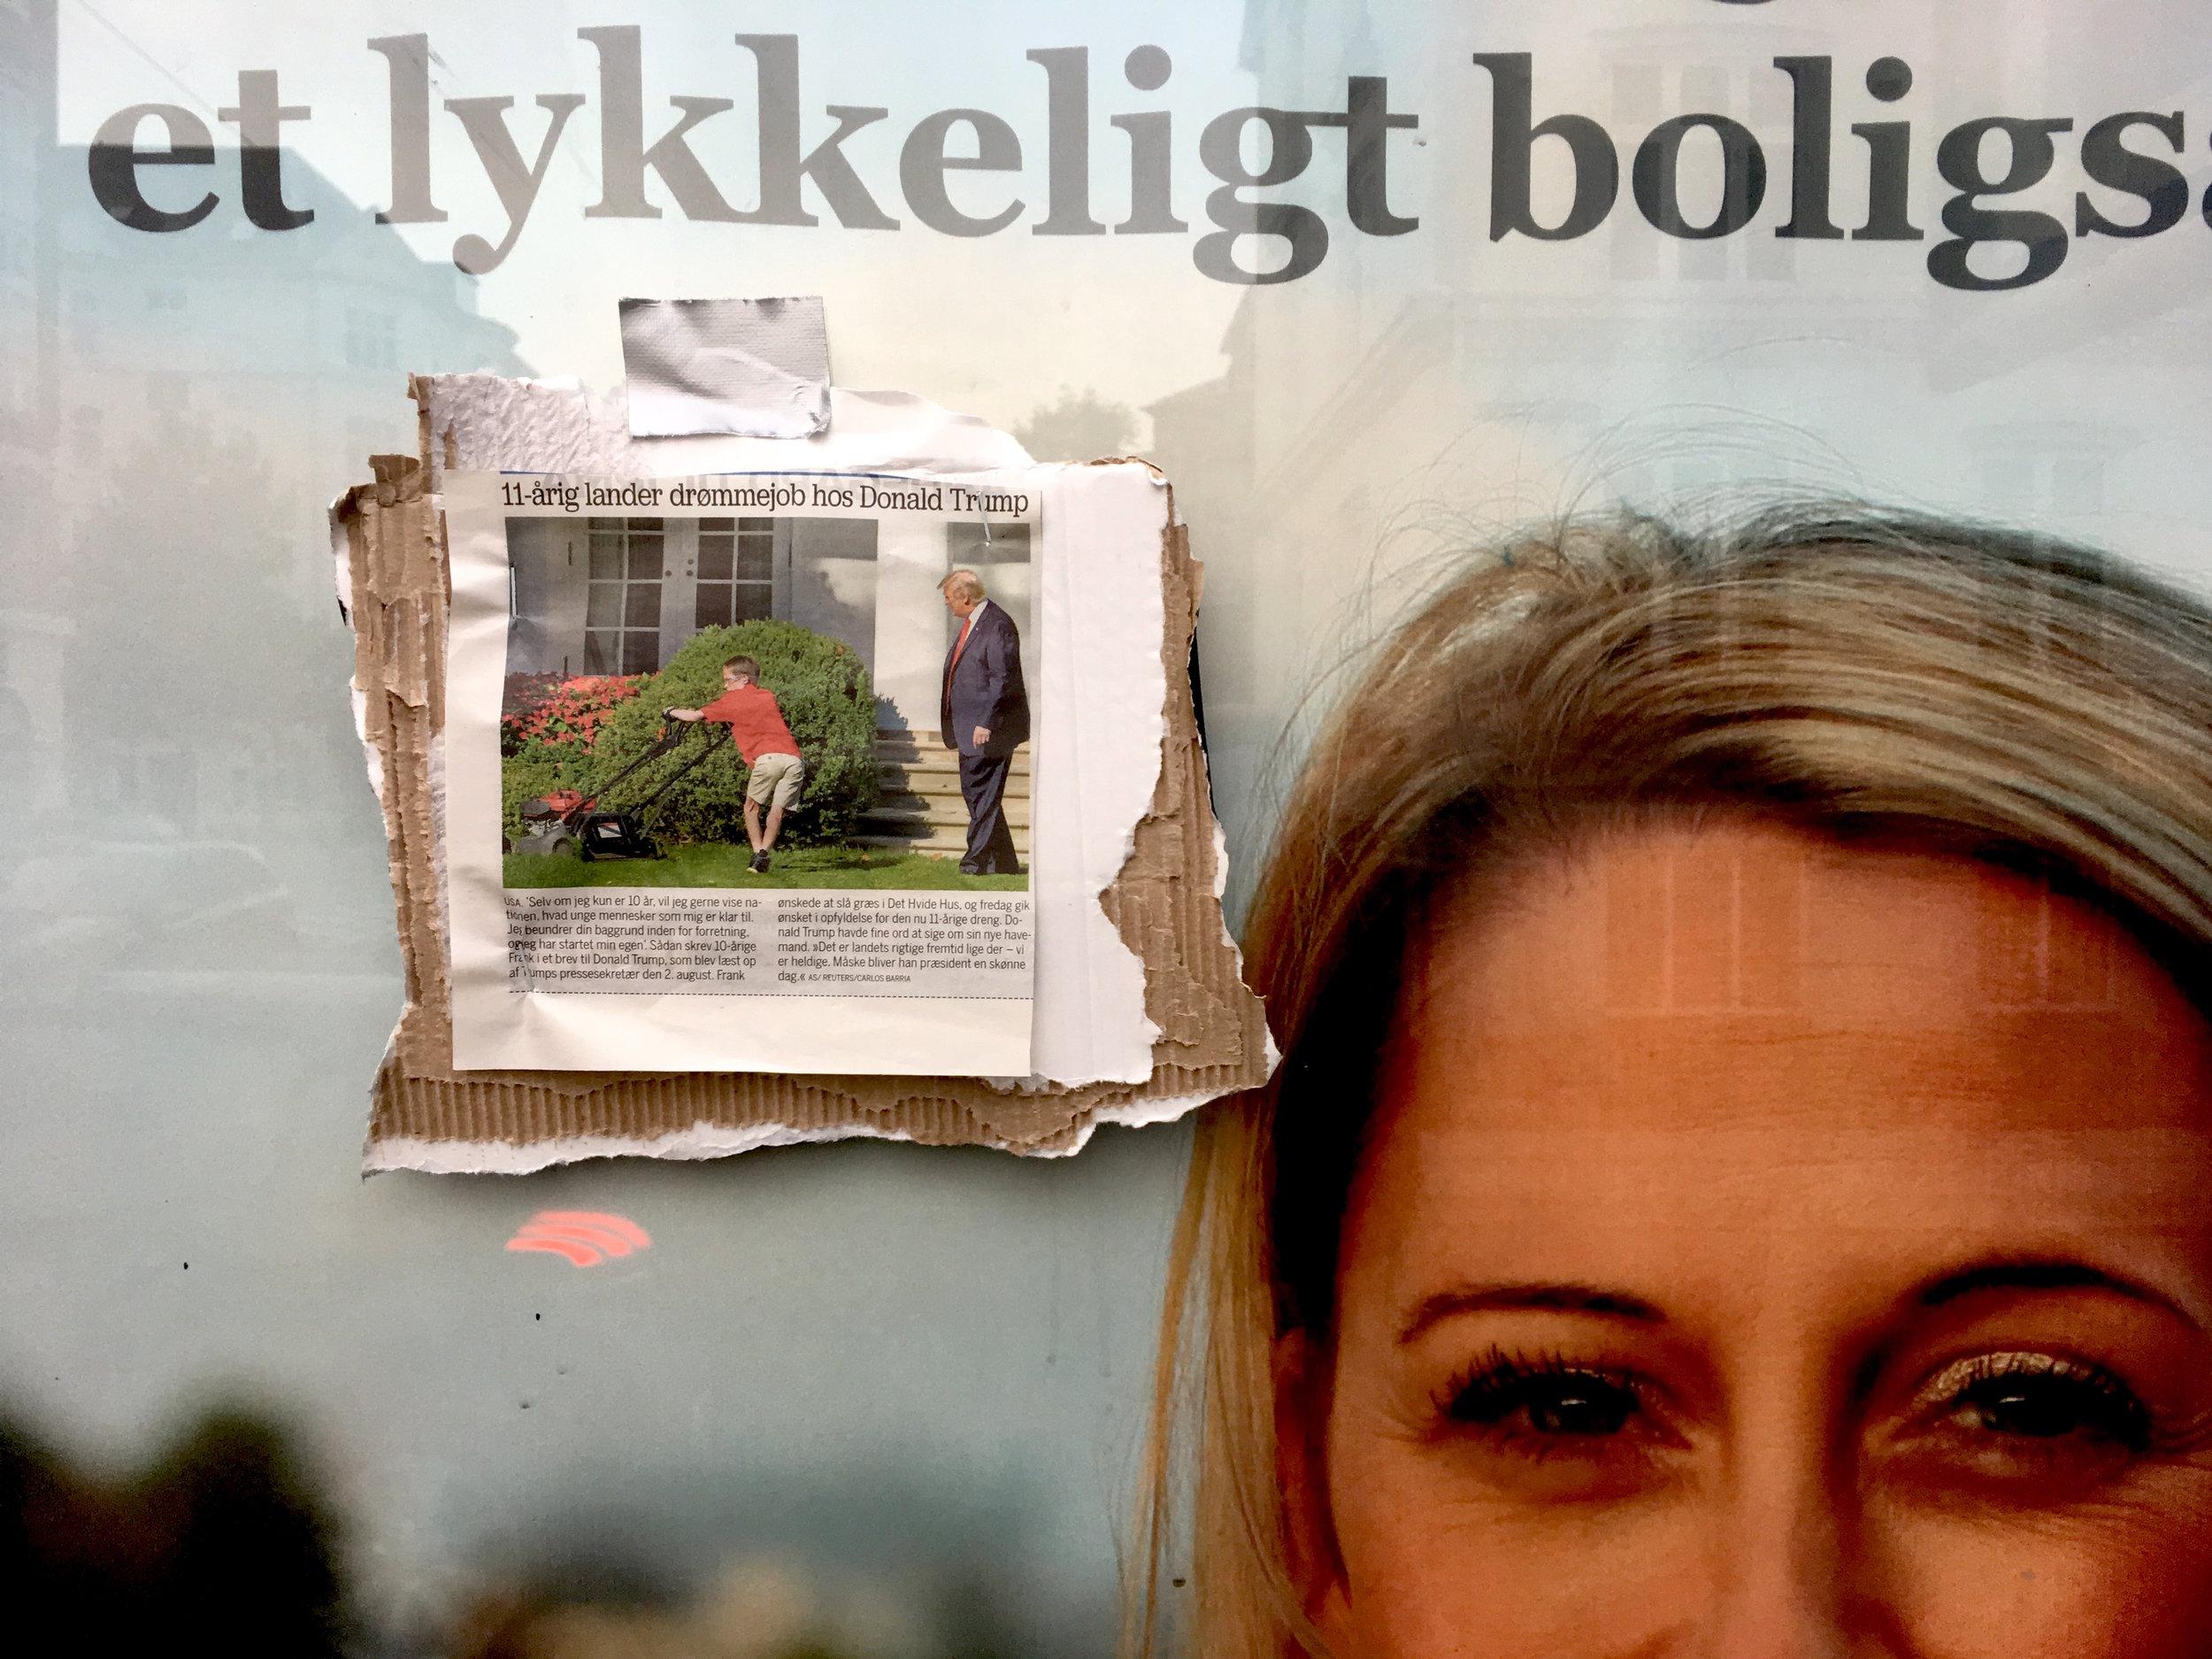 copenhagen-ultrcontemporary-biennale--18-sept-2017_37318563245_o.jpg